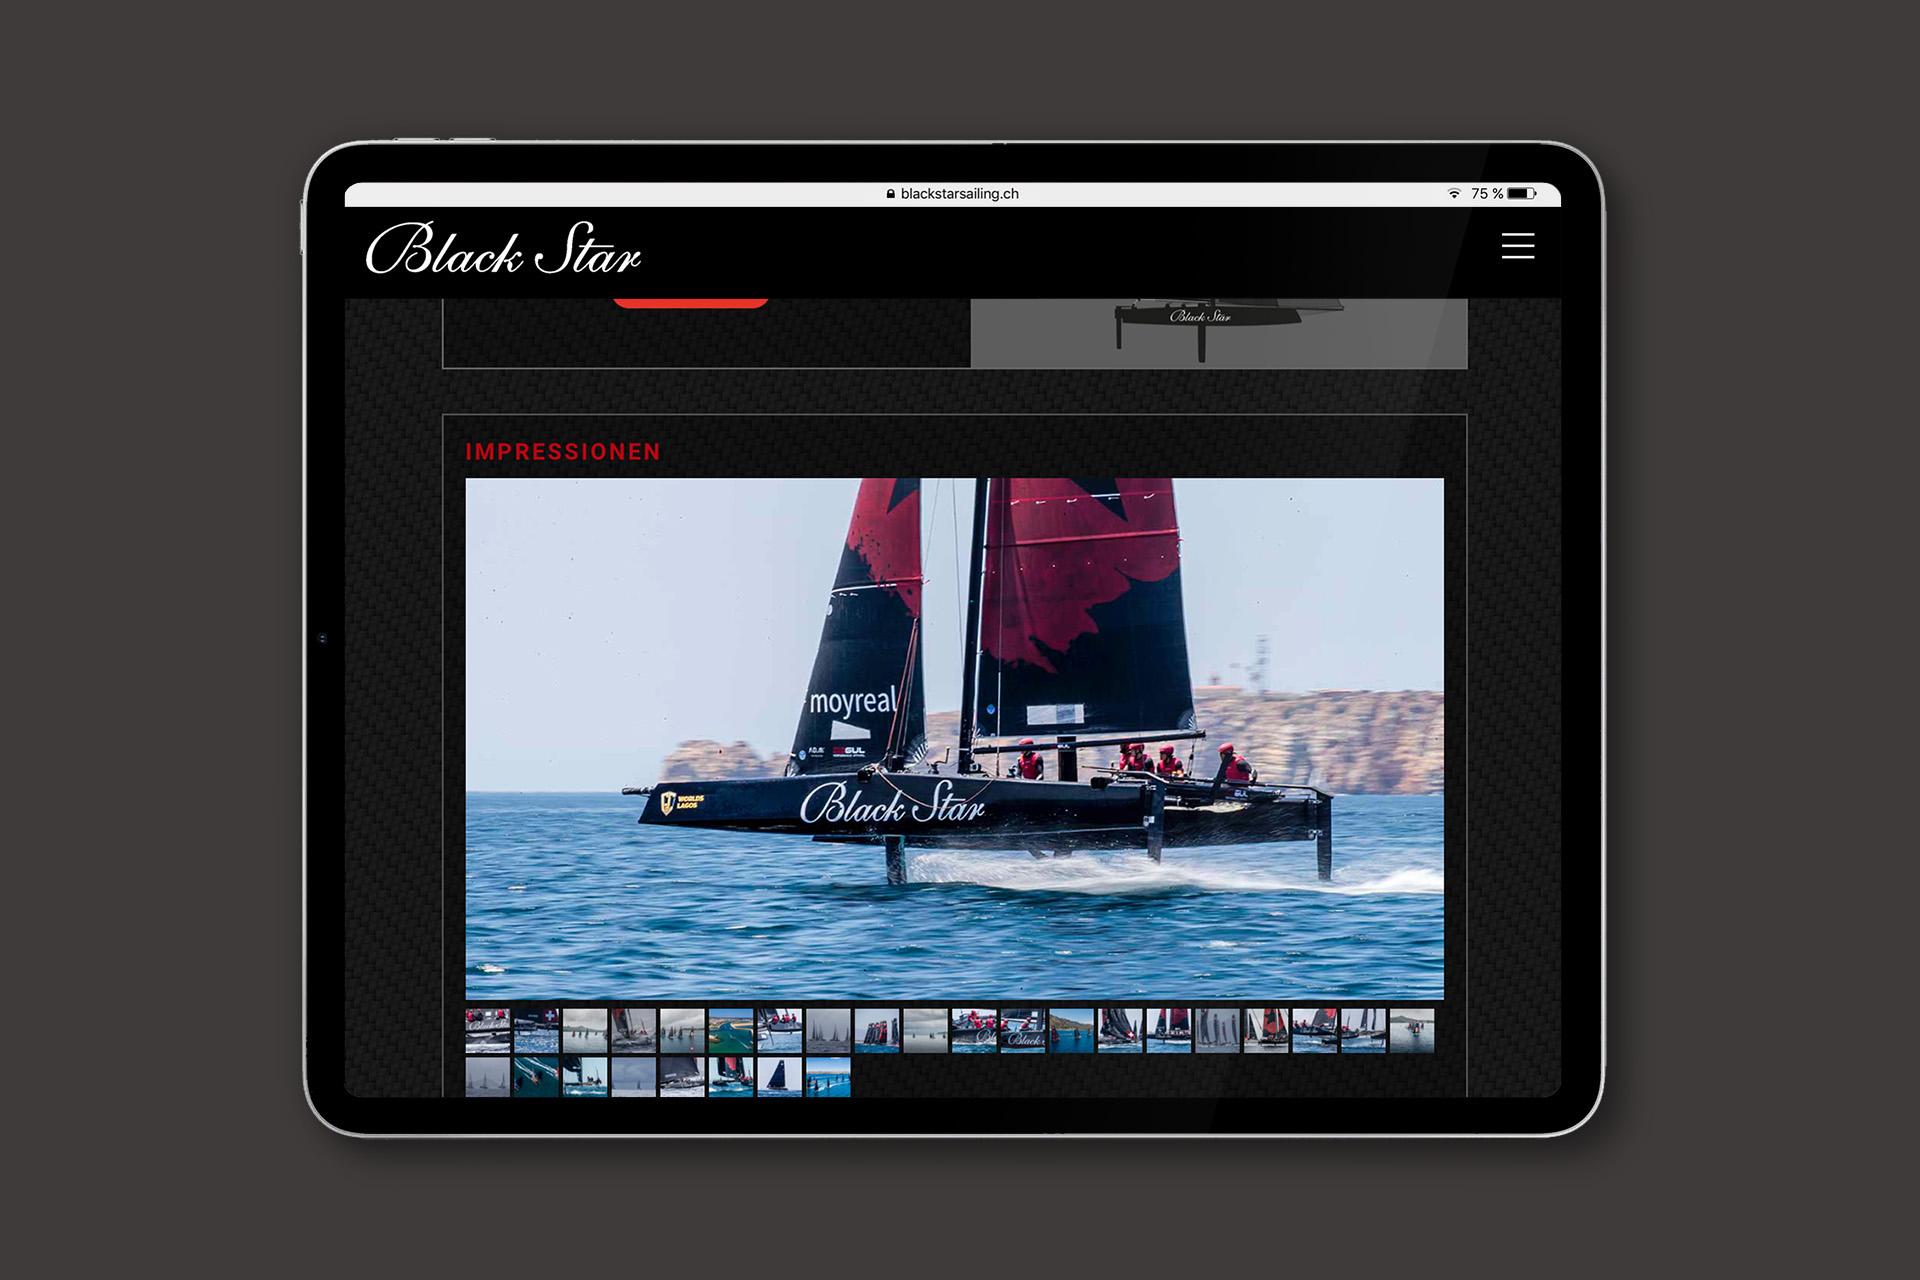 BlackStarSailing_iPad_09